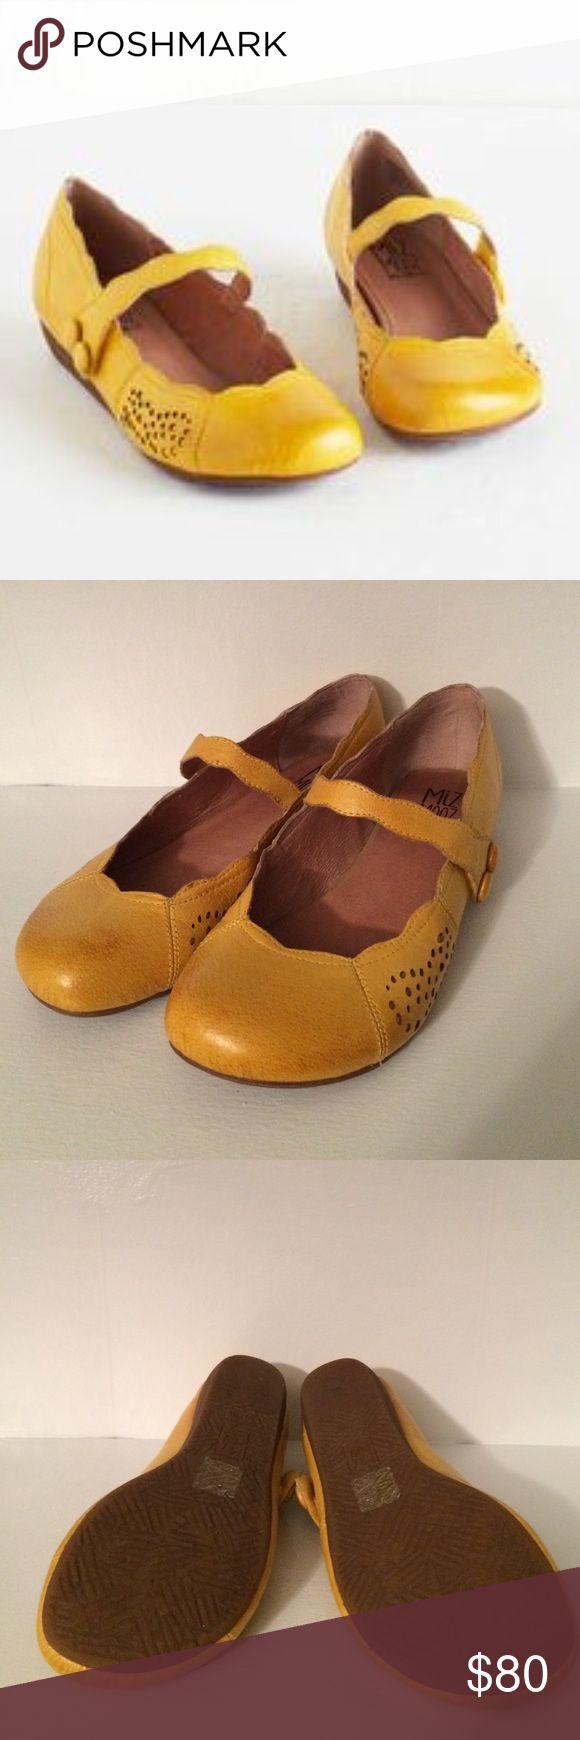 Miz Mooz Yellow Flats Wonderfully comfortable with velcro closure. Worn twice. Euro size 38.5. Shoes